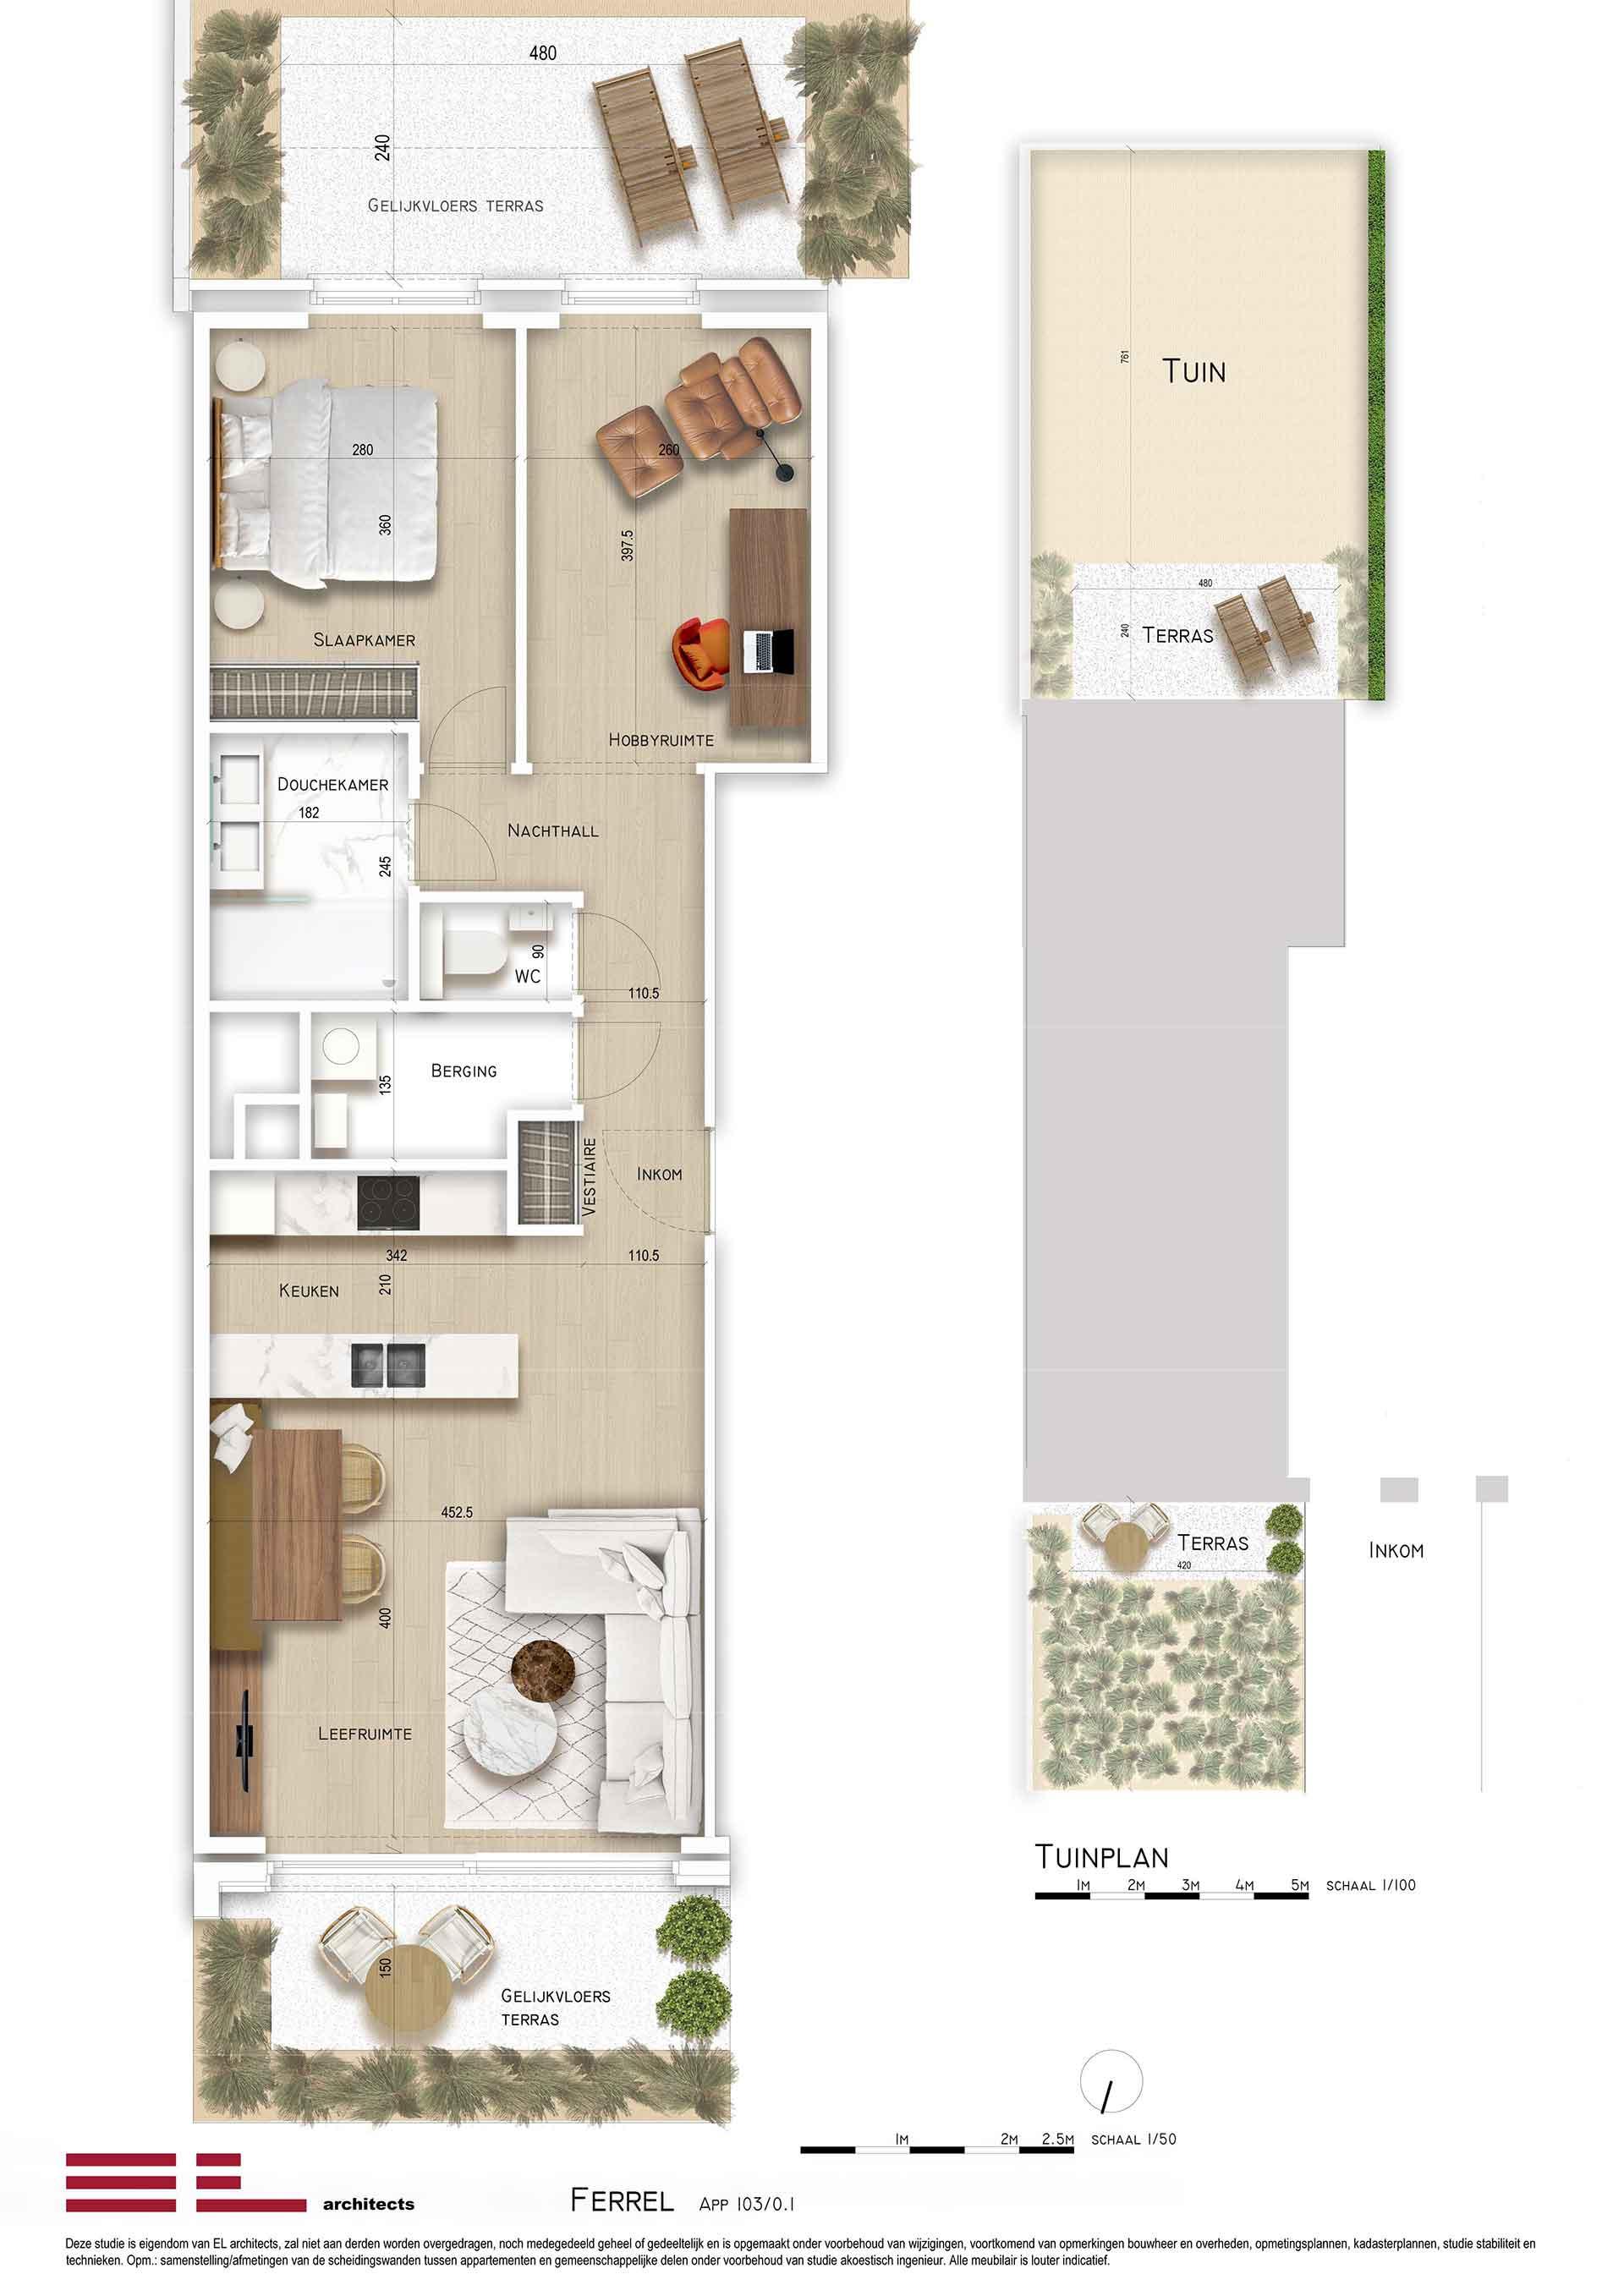 Residentie <br/> Ferrel - image appartement-te-koop-sint-idesbald-residentie-ferrel-appartement-gv01 on https://hoprom.be